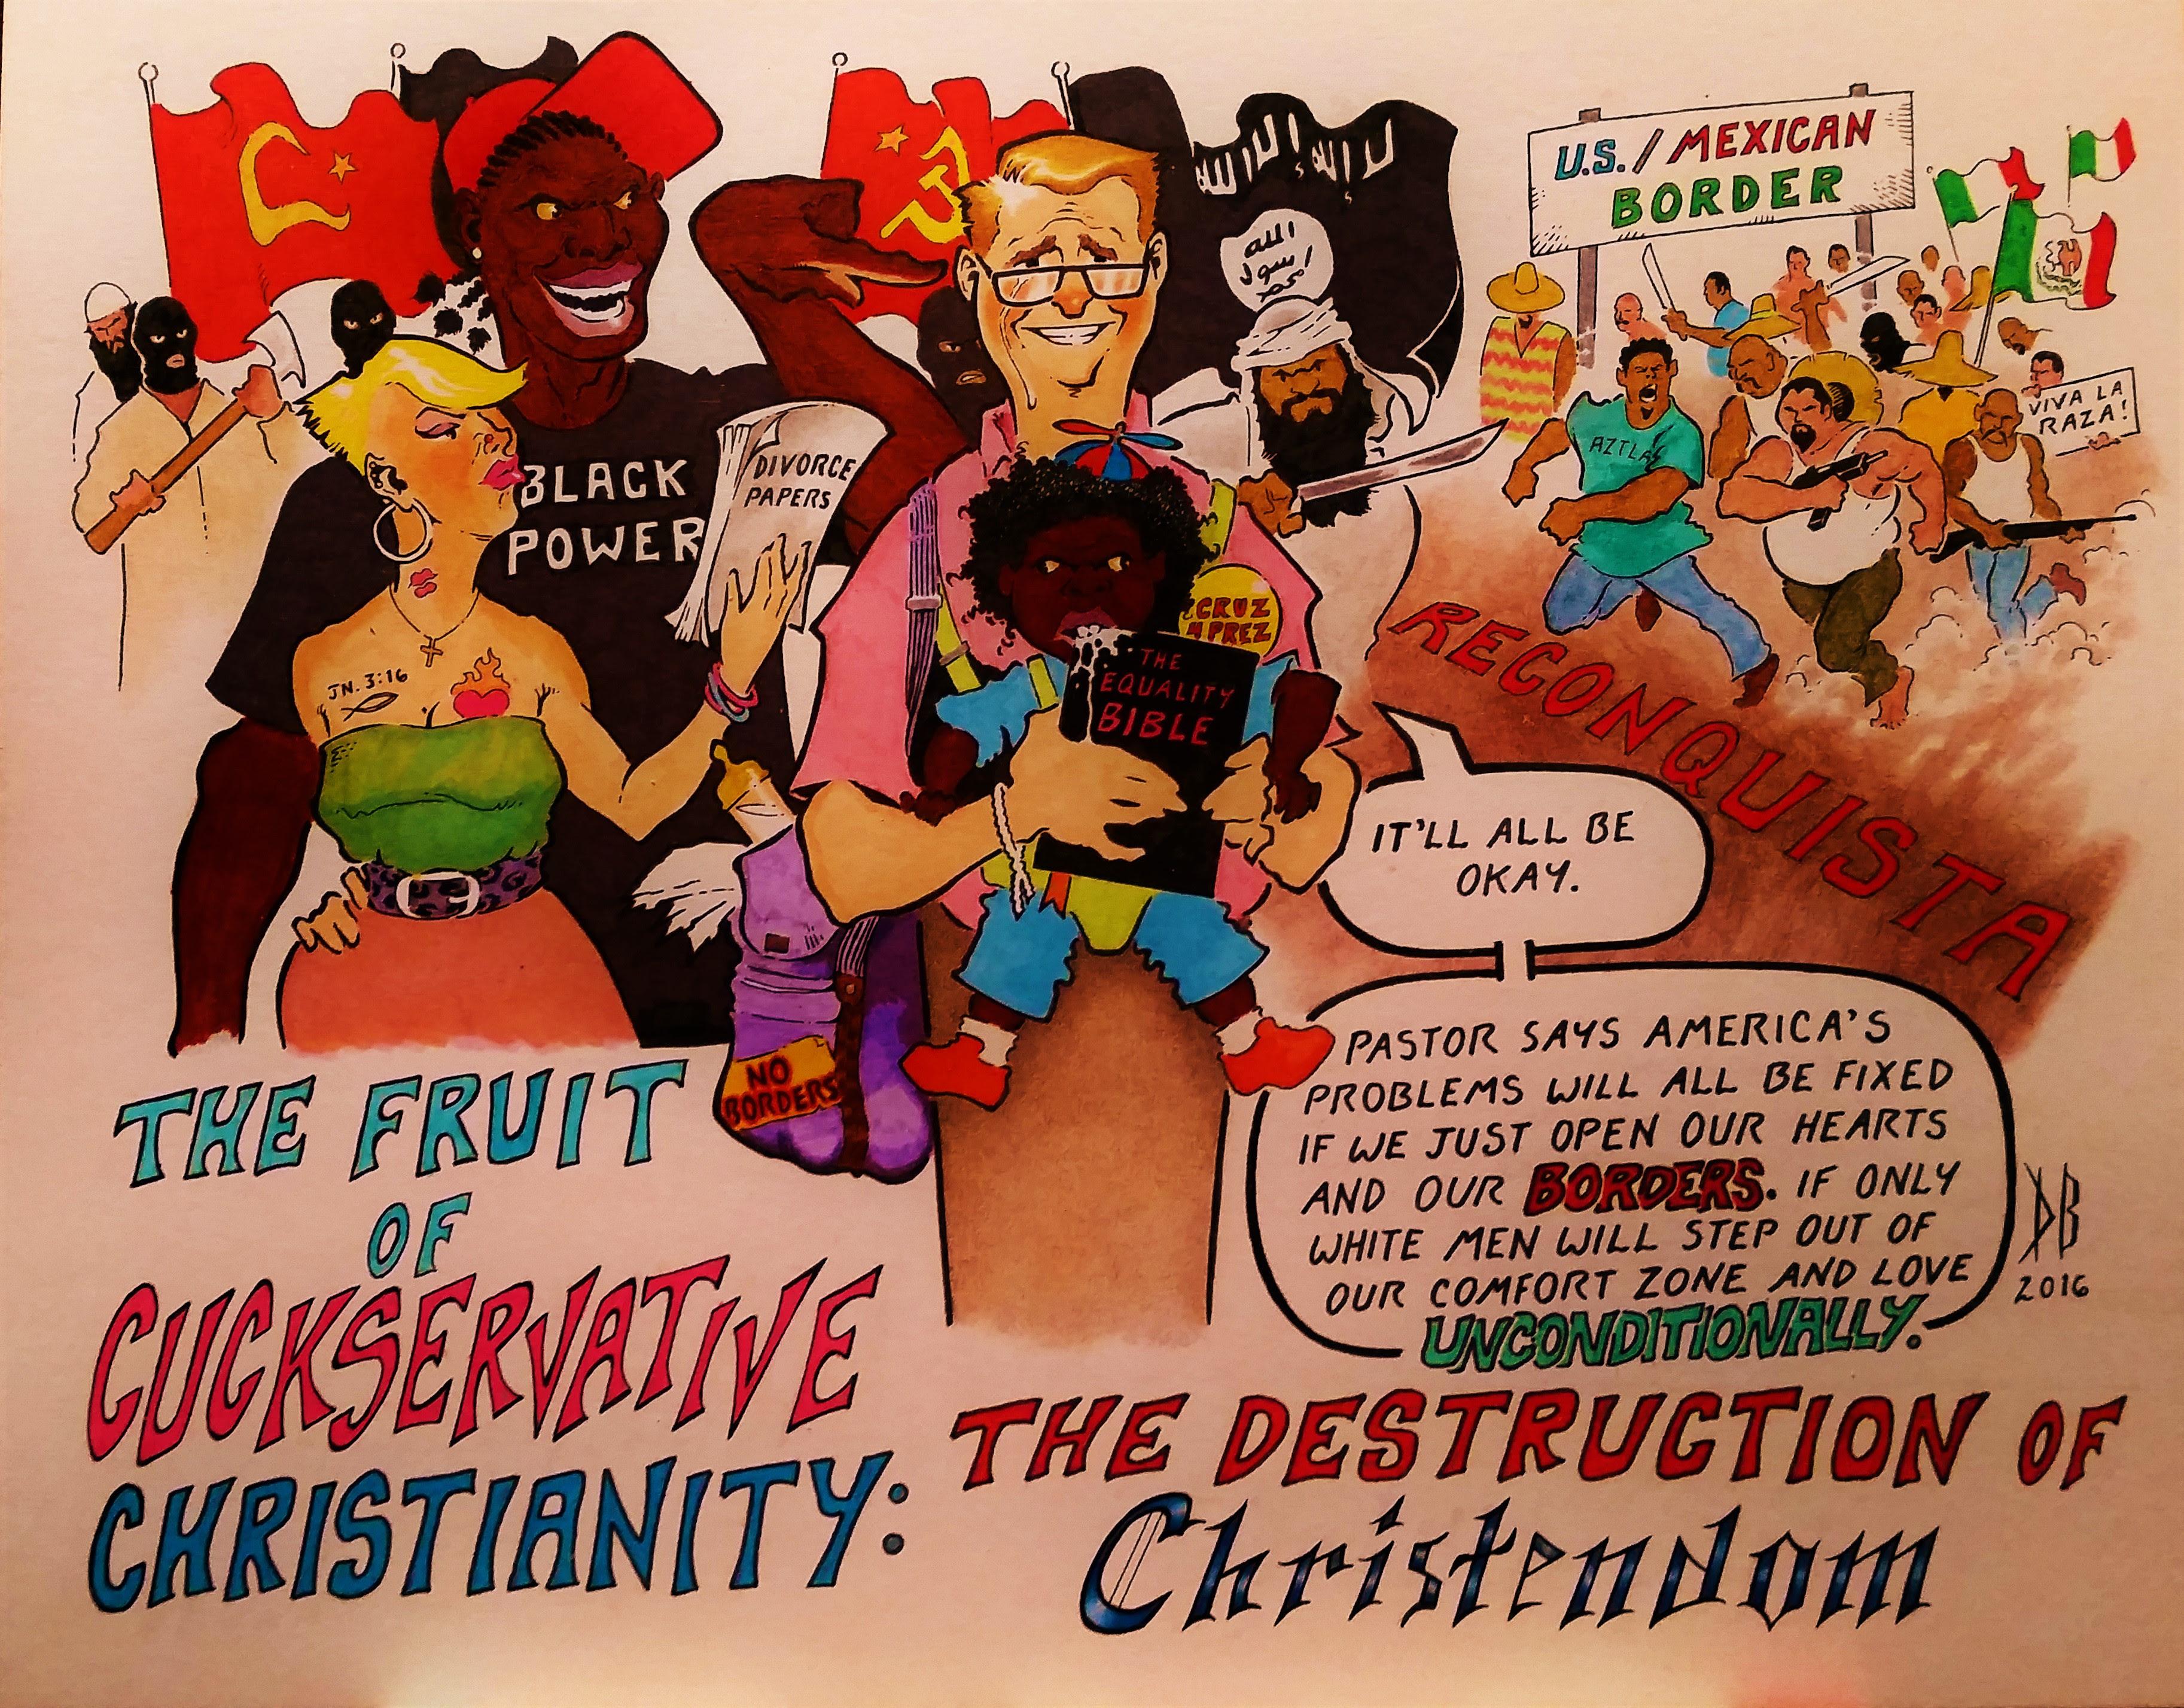 Cuckservative-Christianity-infidelitous-RINO-Quisling-SJW-GOP-neoconservative-open-borders-cuckoldry-Hosea-adultery